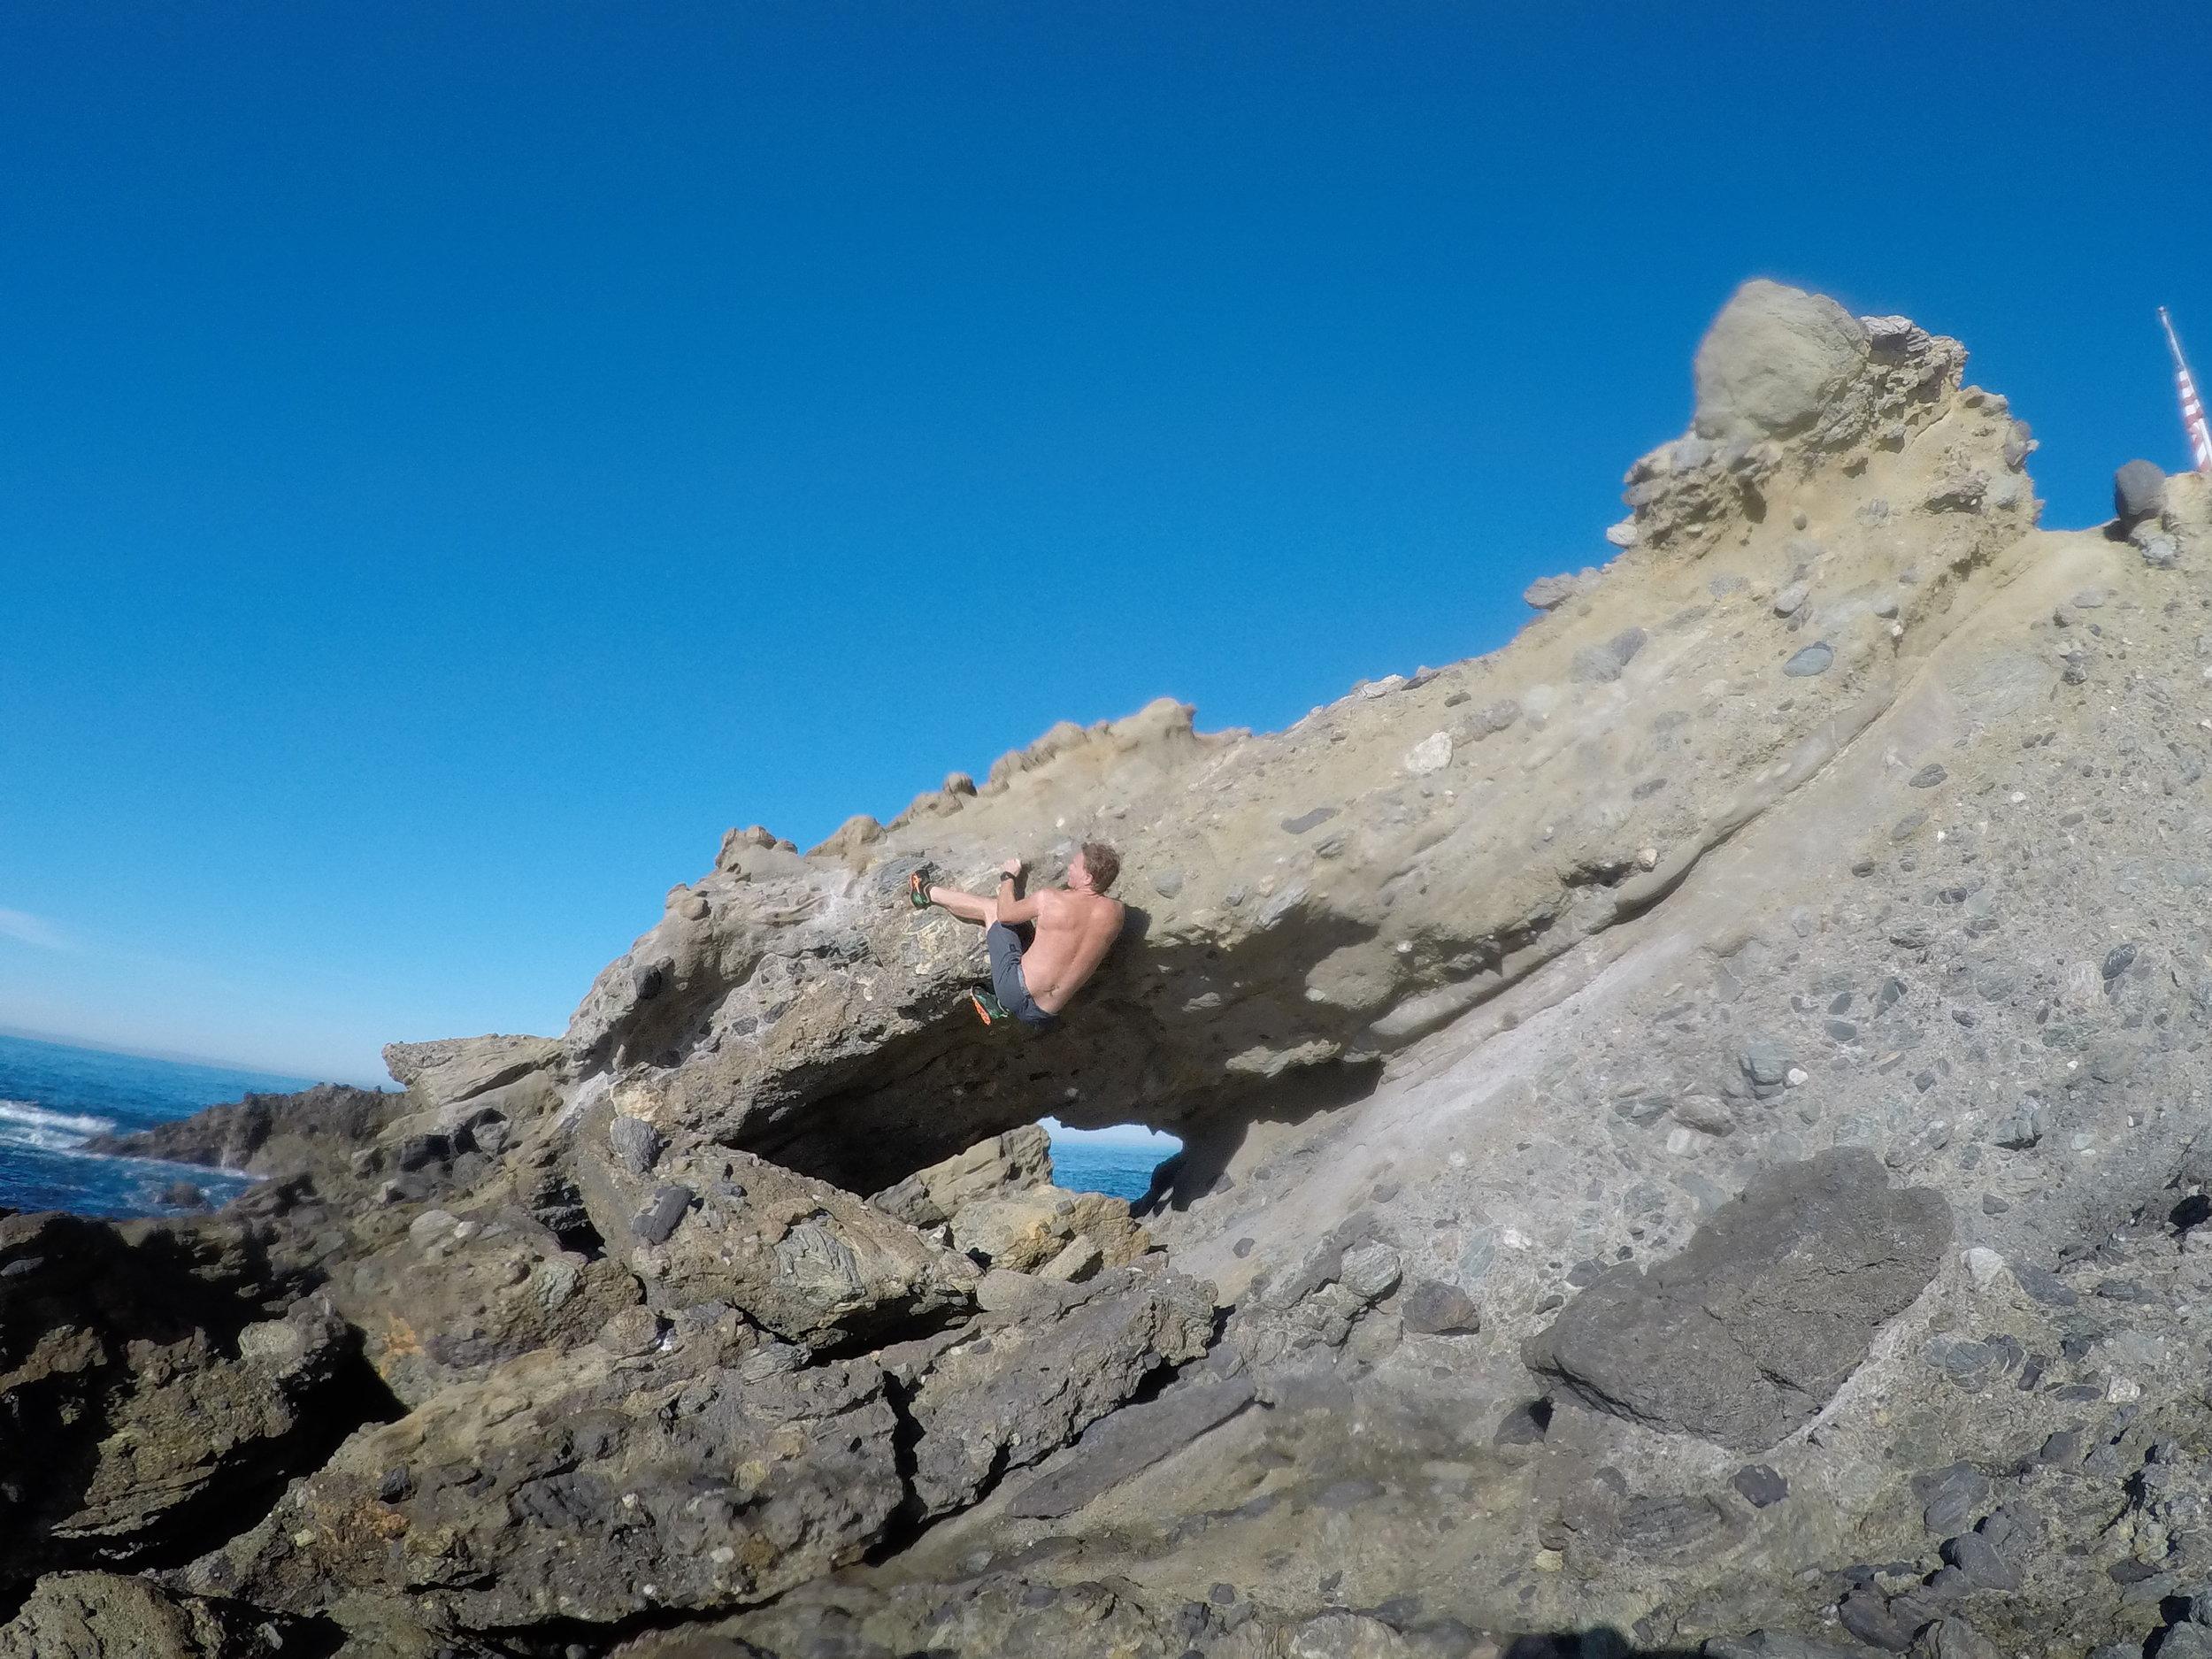 Eric climbing oean water active GOPR1429.JPG